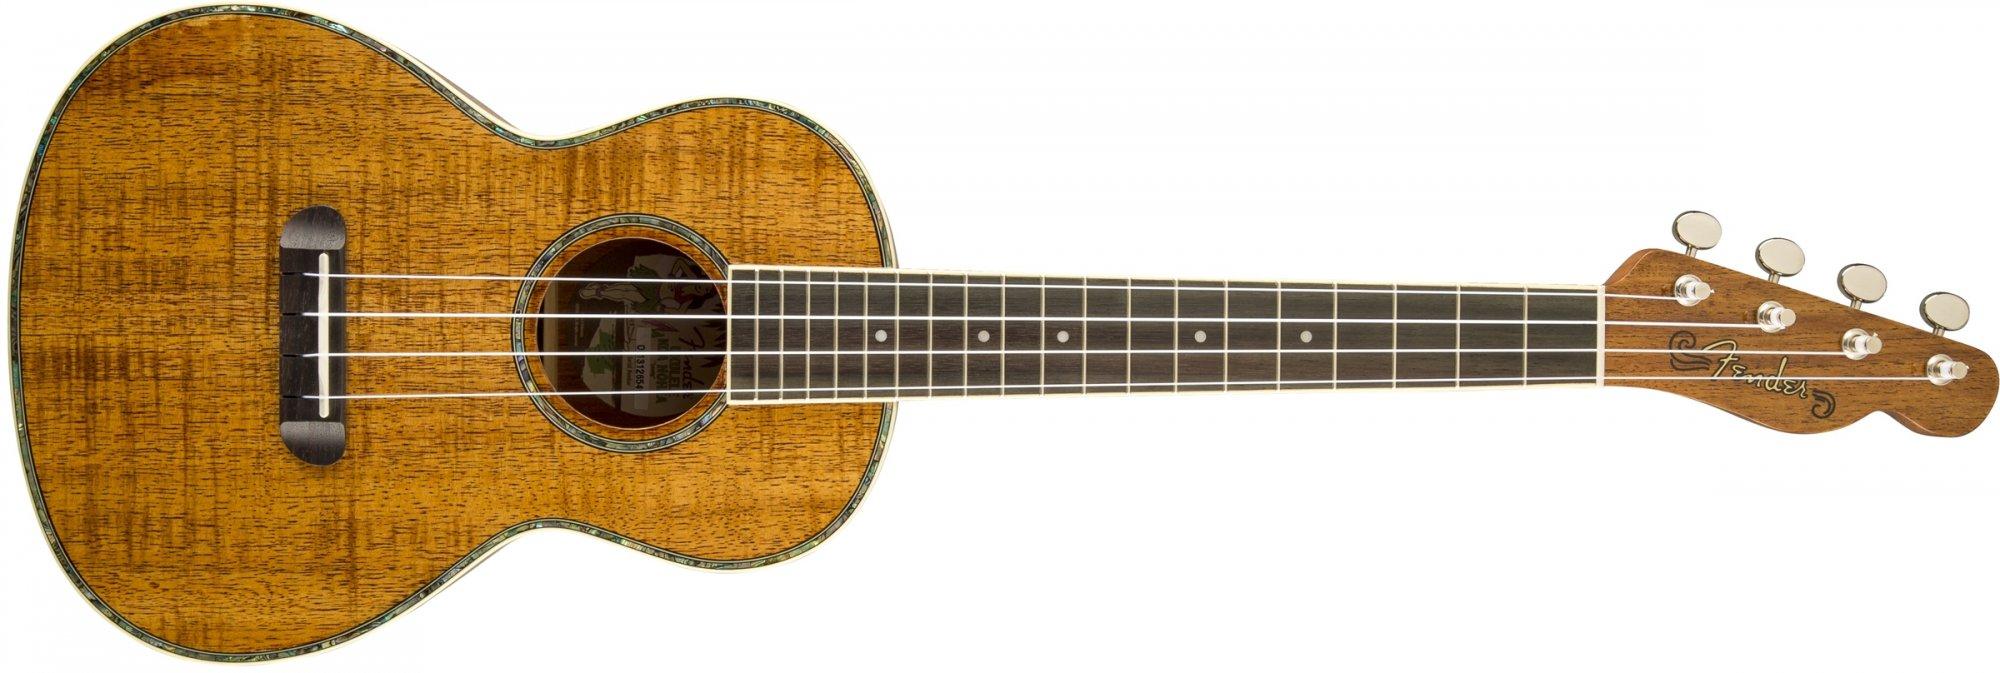 Preowned Fender Koa Nohea Tenor Ukulele